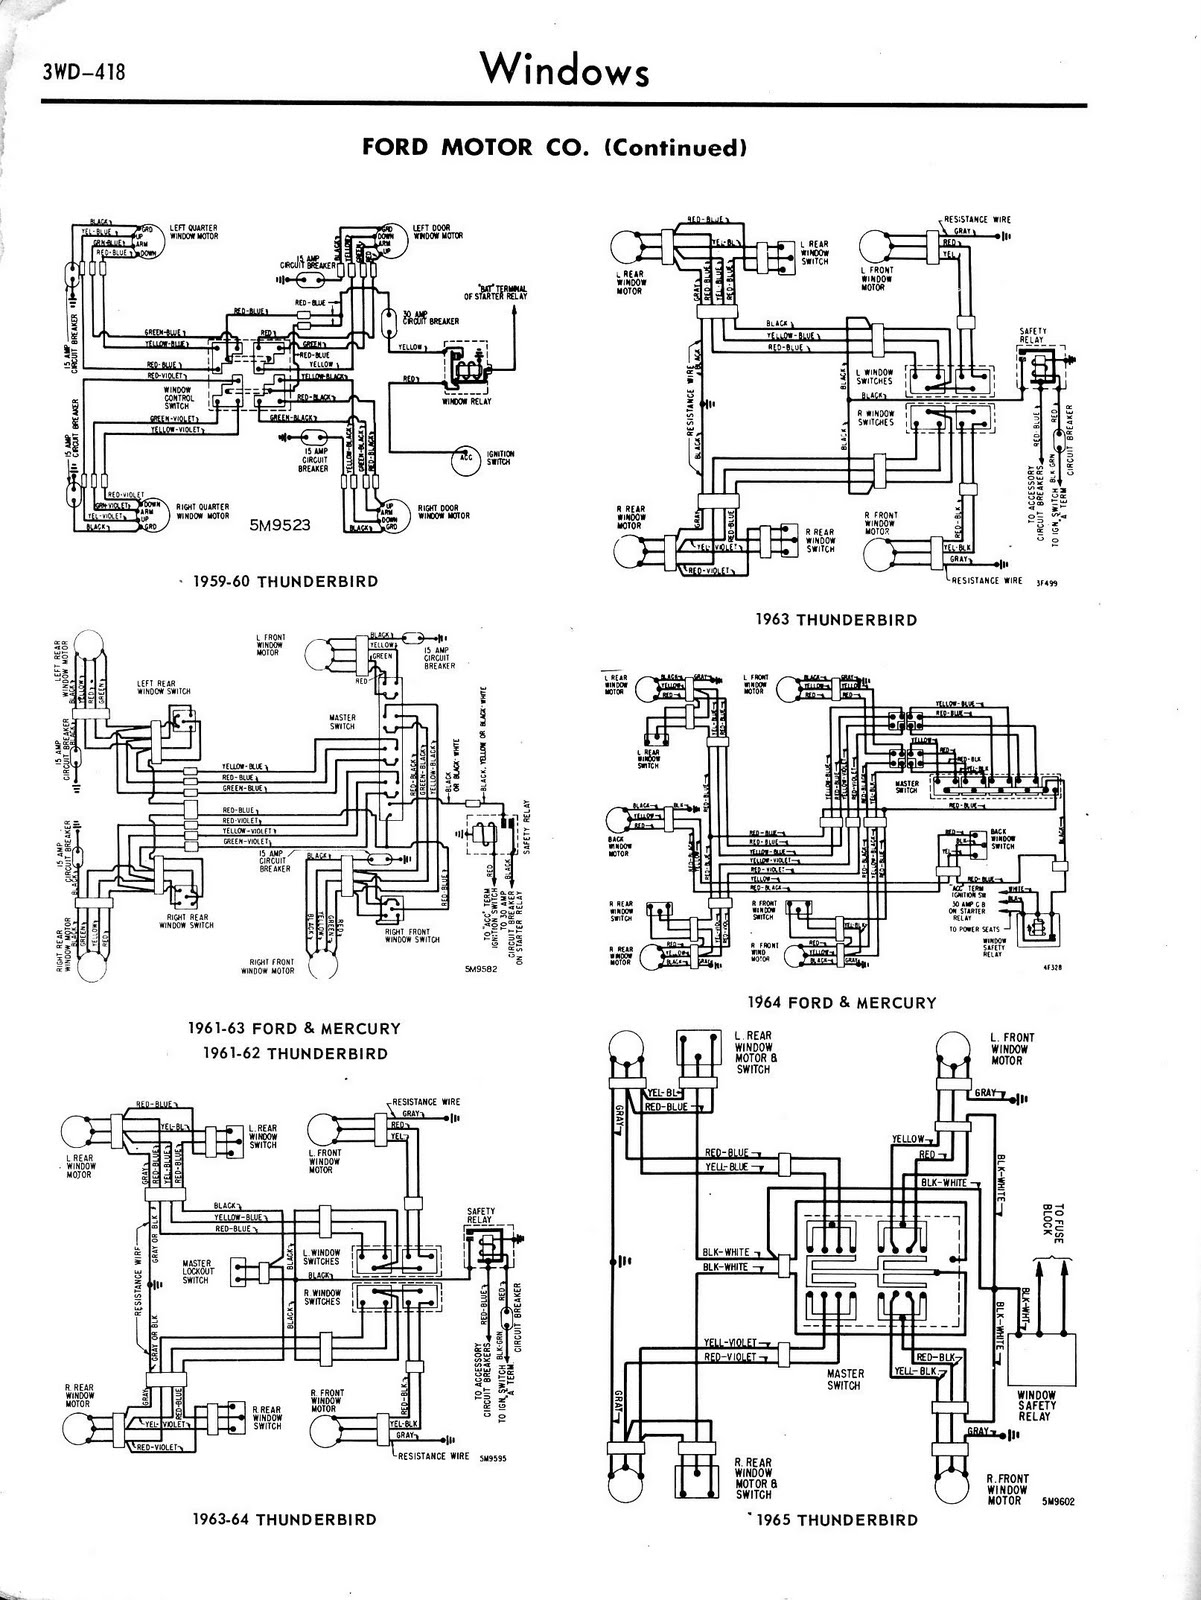 2006 Gto Power Windows Wiring Diagram Schematic Diagrams 68 Wire Data 1969